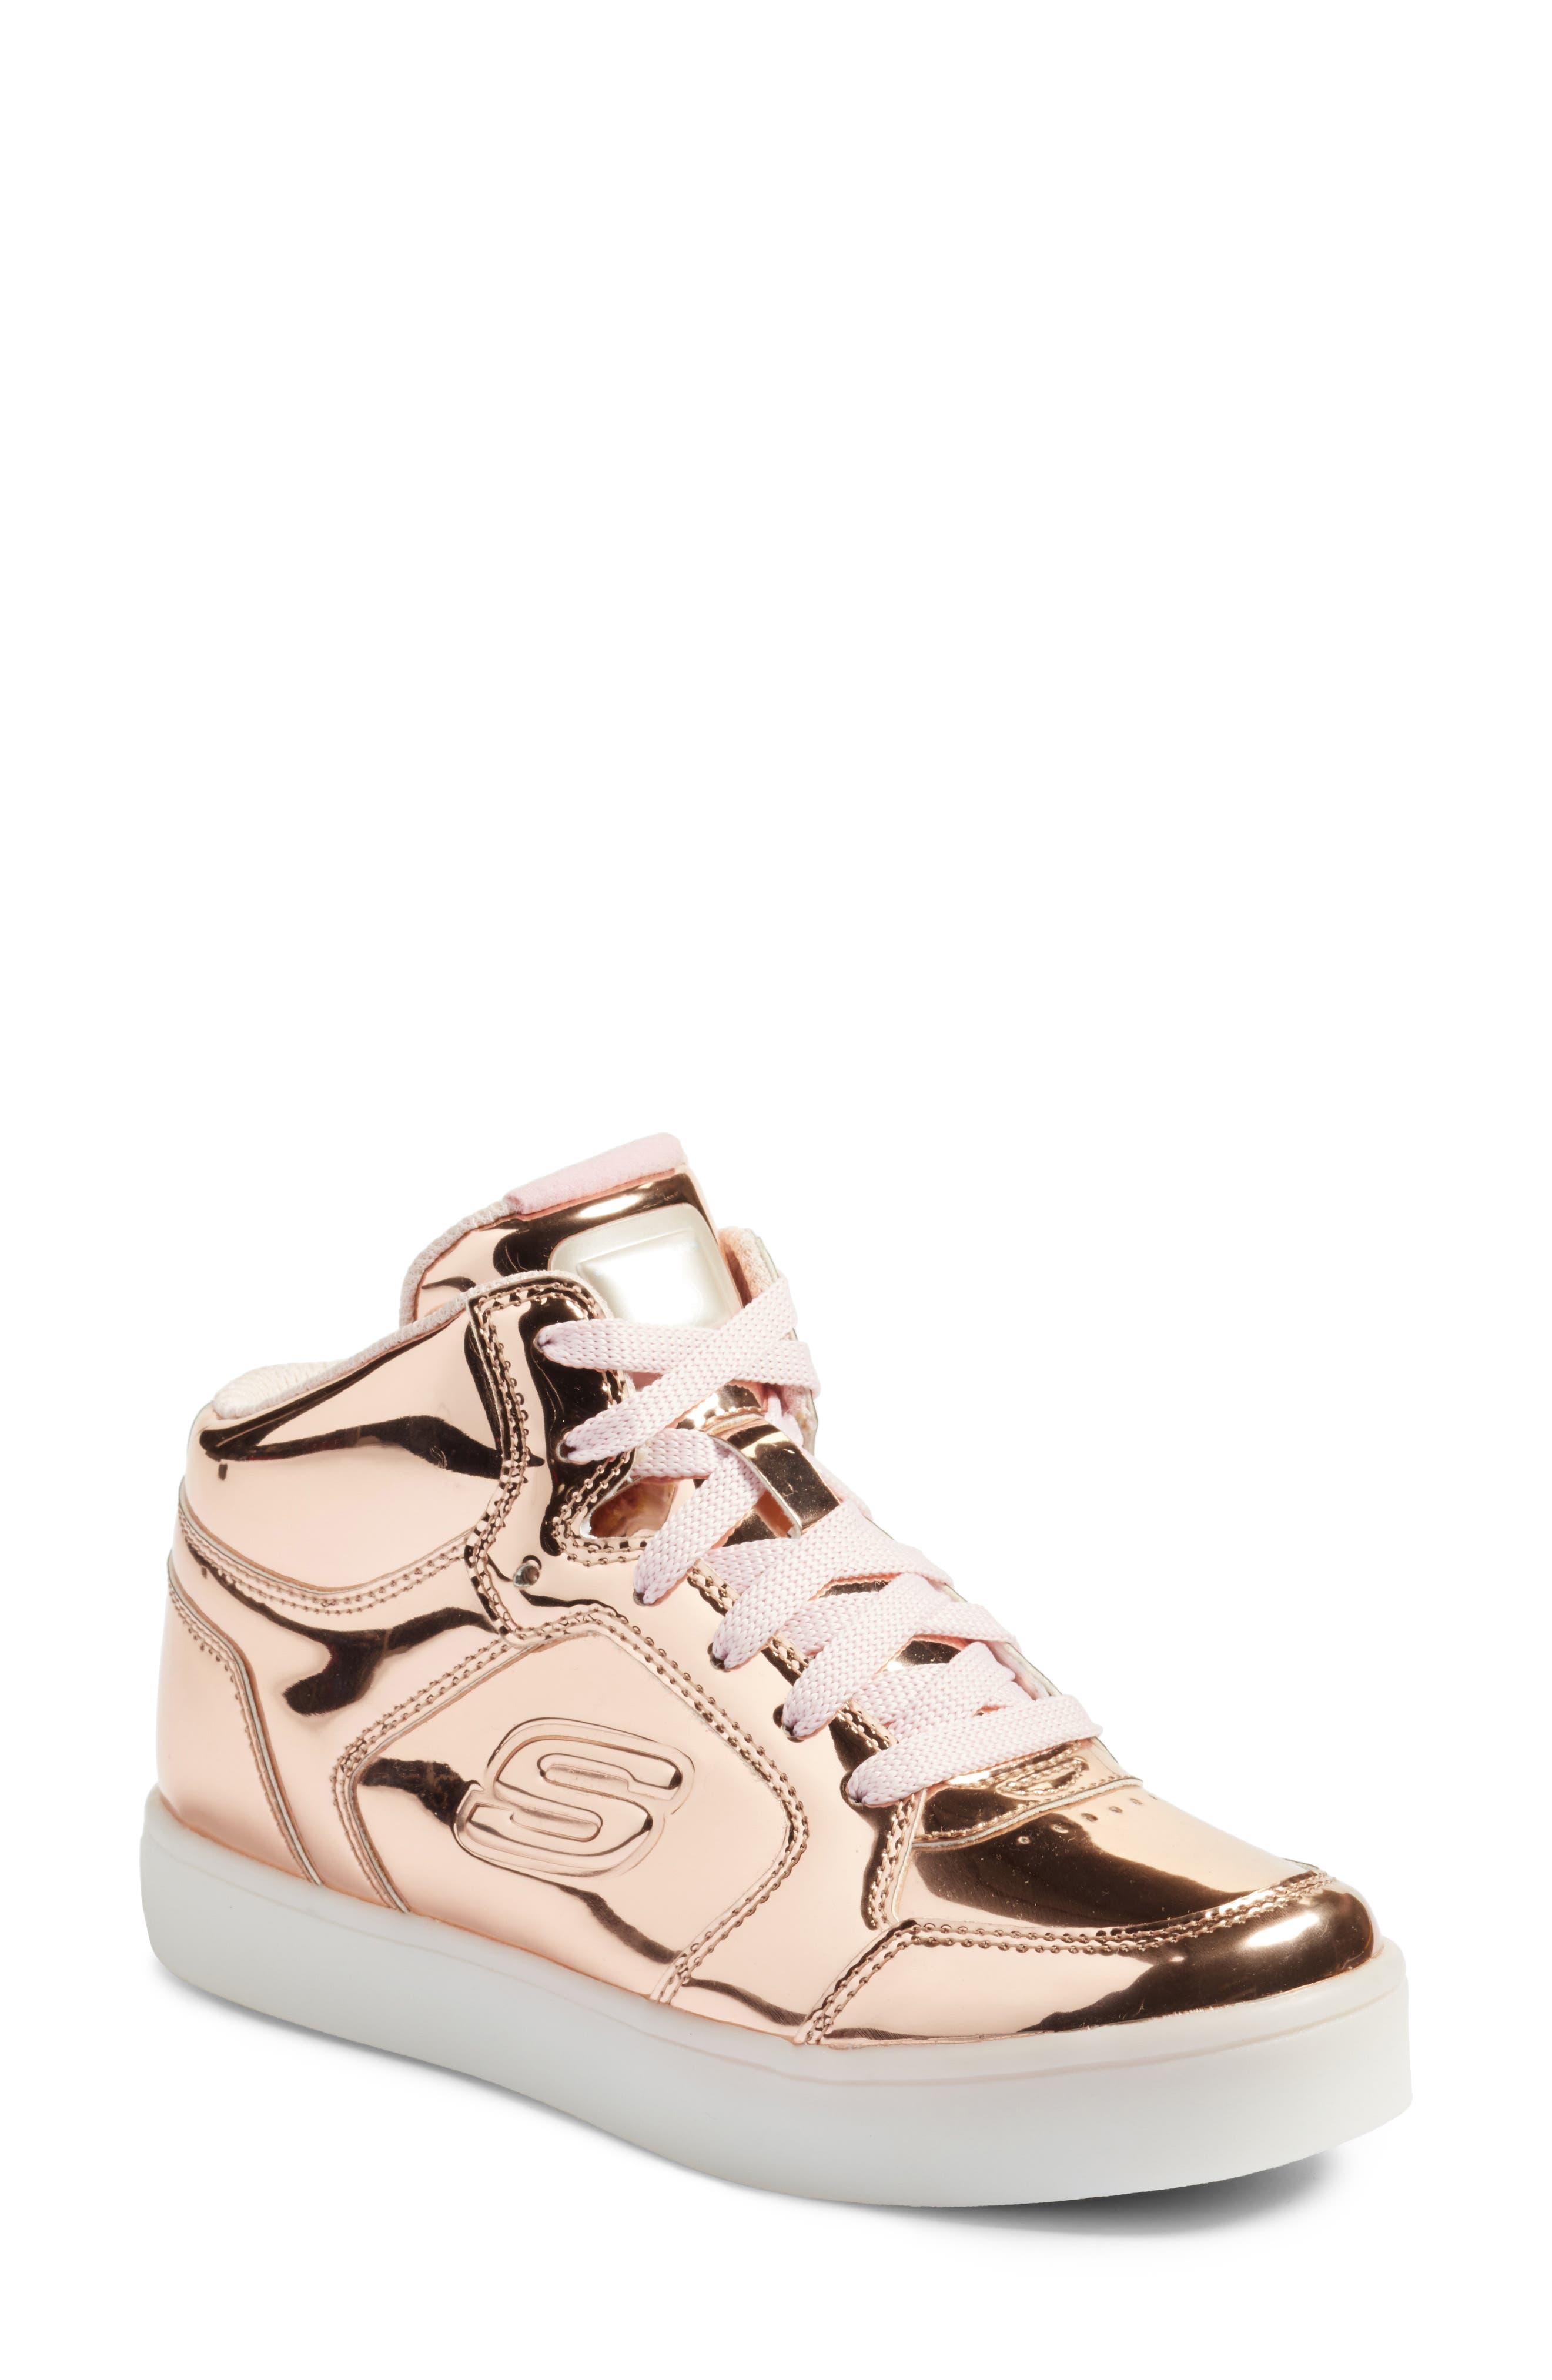 Energy Lights Metallic High Top Sneaker,                             Main thumbnail 4, color,